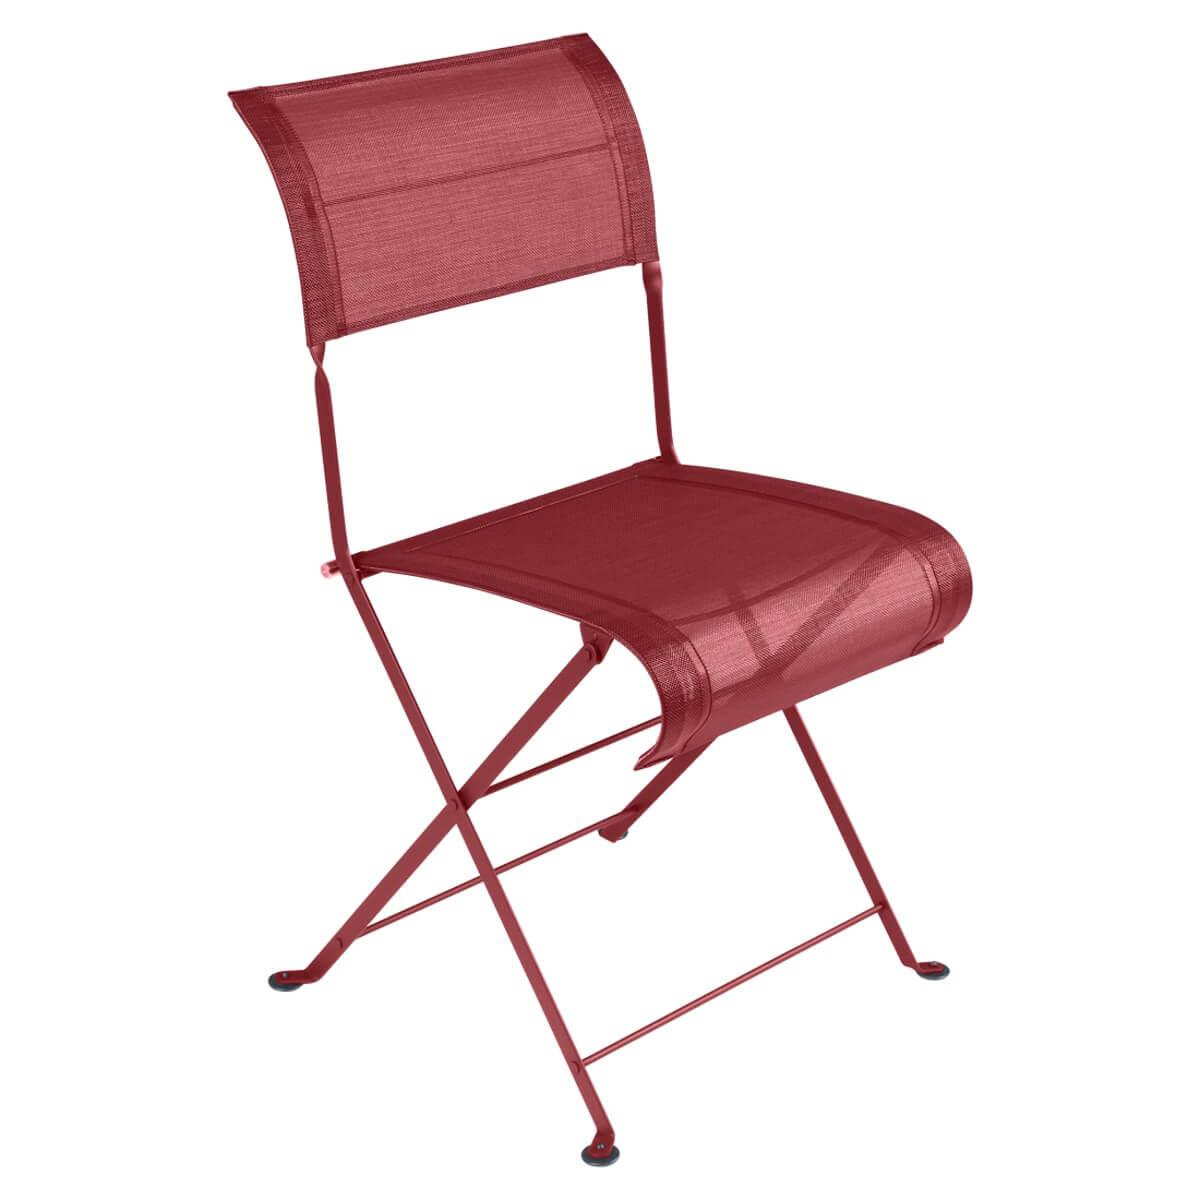 Chaise pliante DUNE PREMIUM Fermob rouge piment